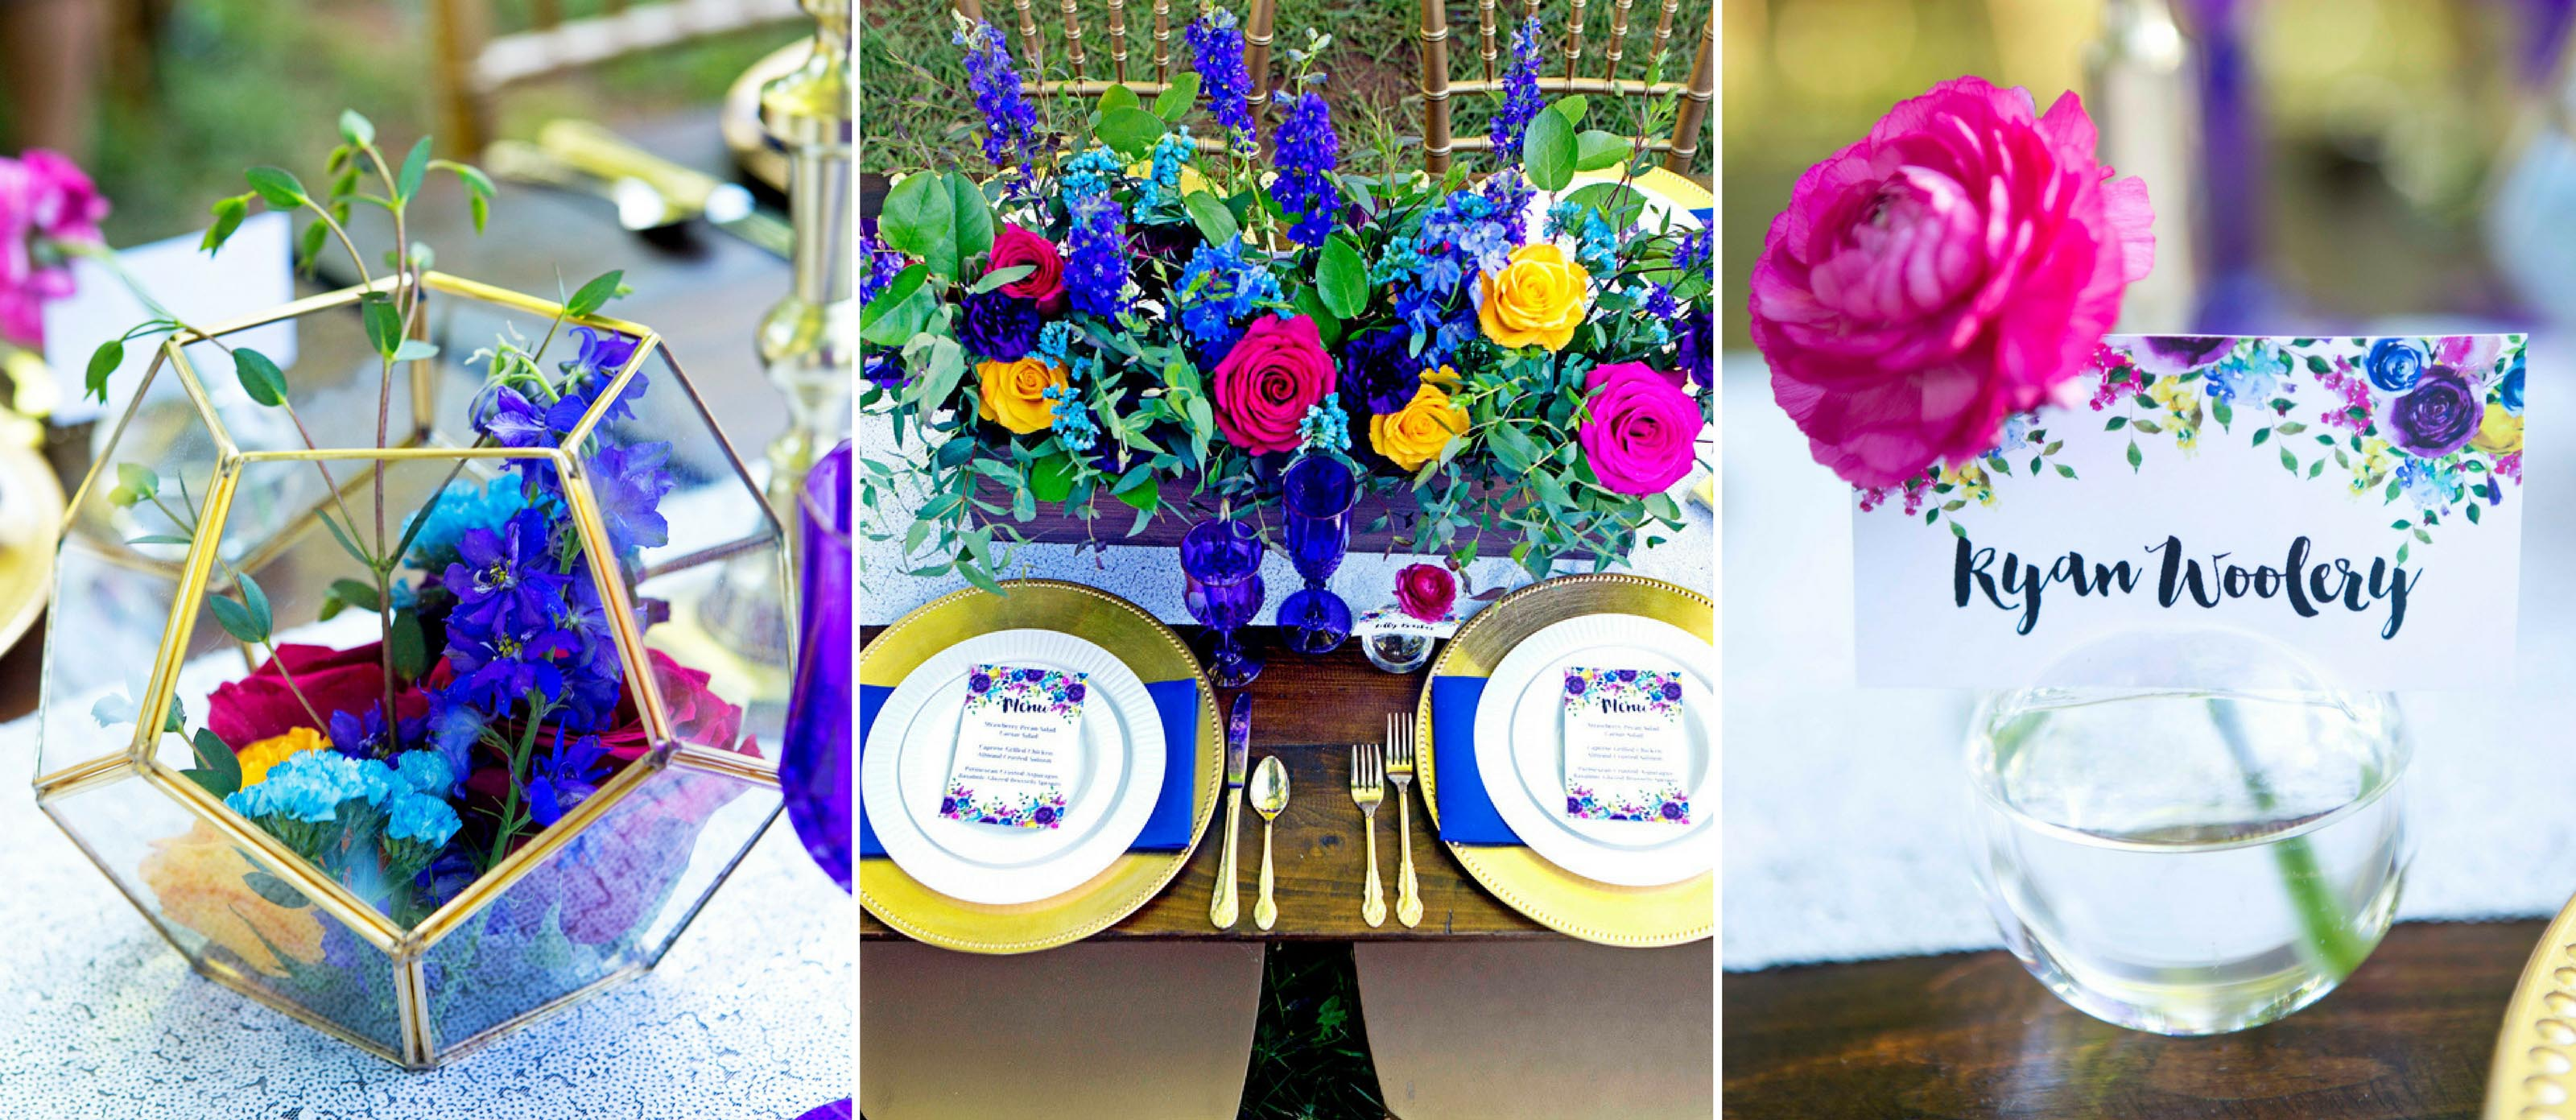 Jewel Tone Wedding Place Settings And Centerpiece Ideas Wedding